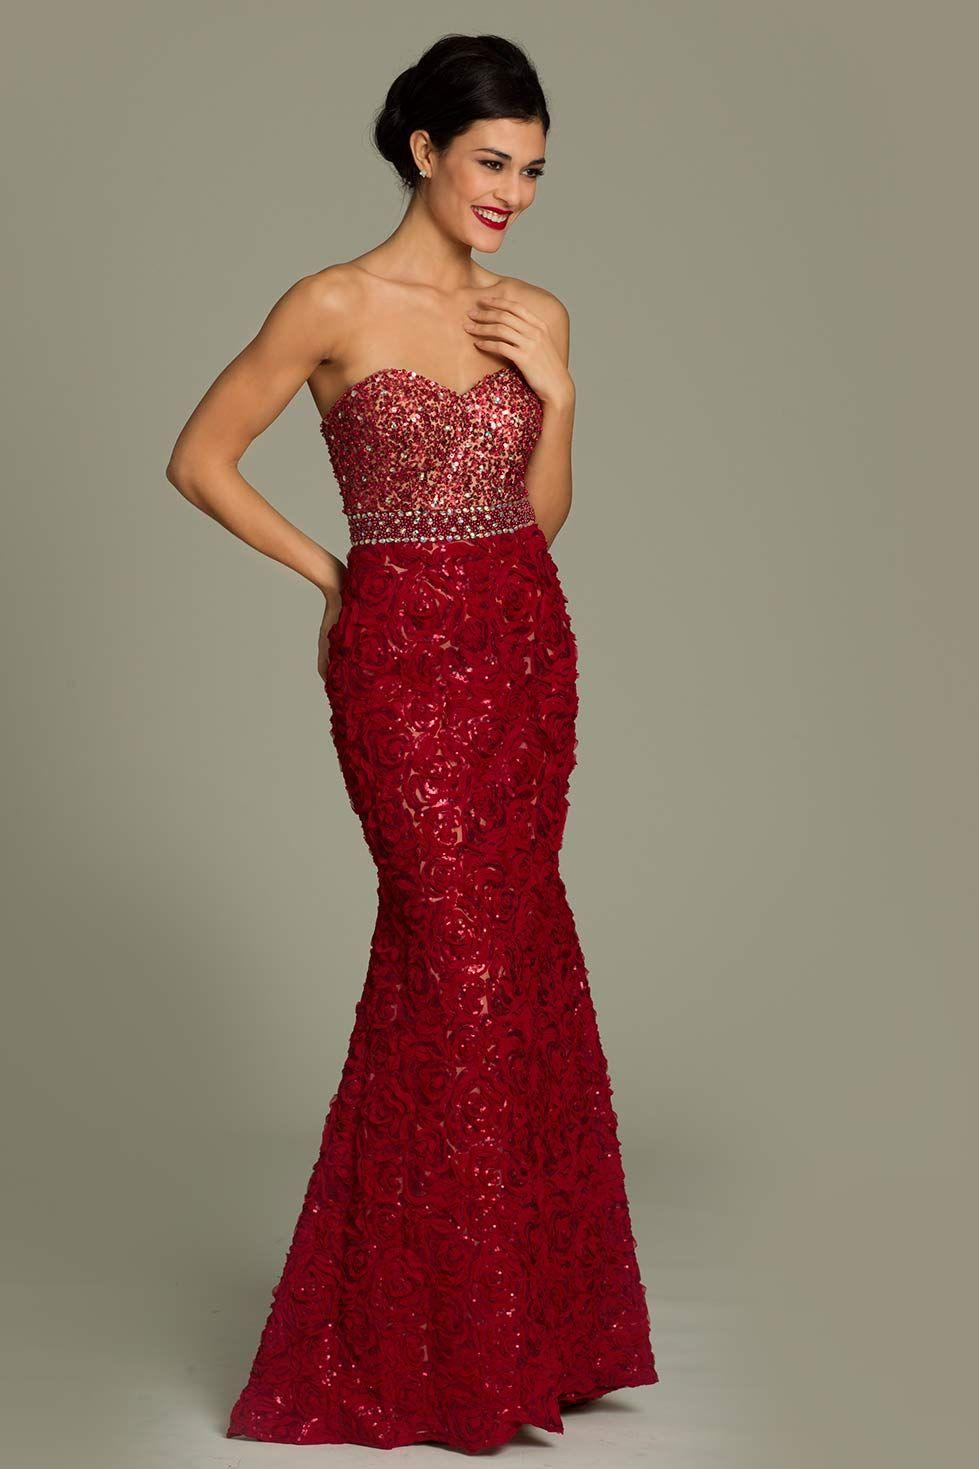 Sweetheart neckline Jovani gown | Evening Gowns | Pinterest | Jovani ...